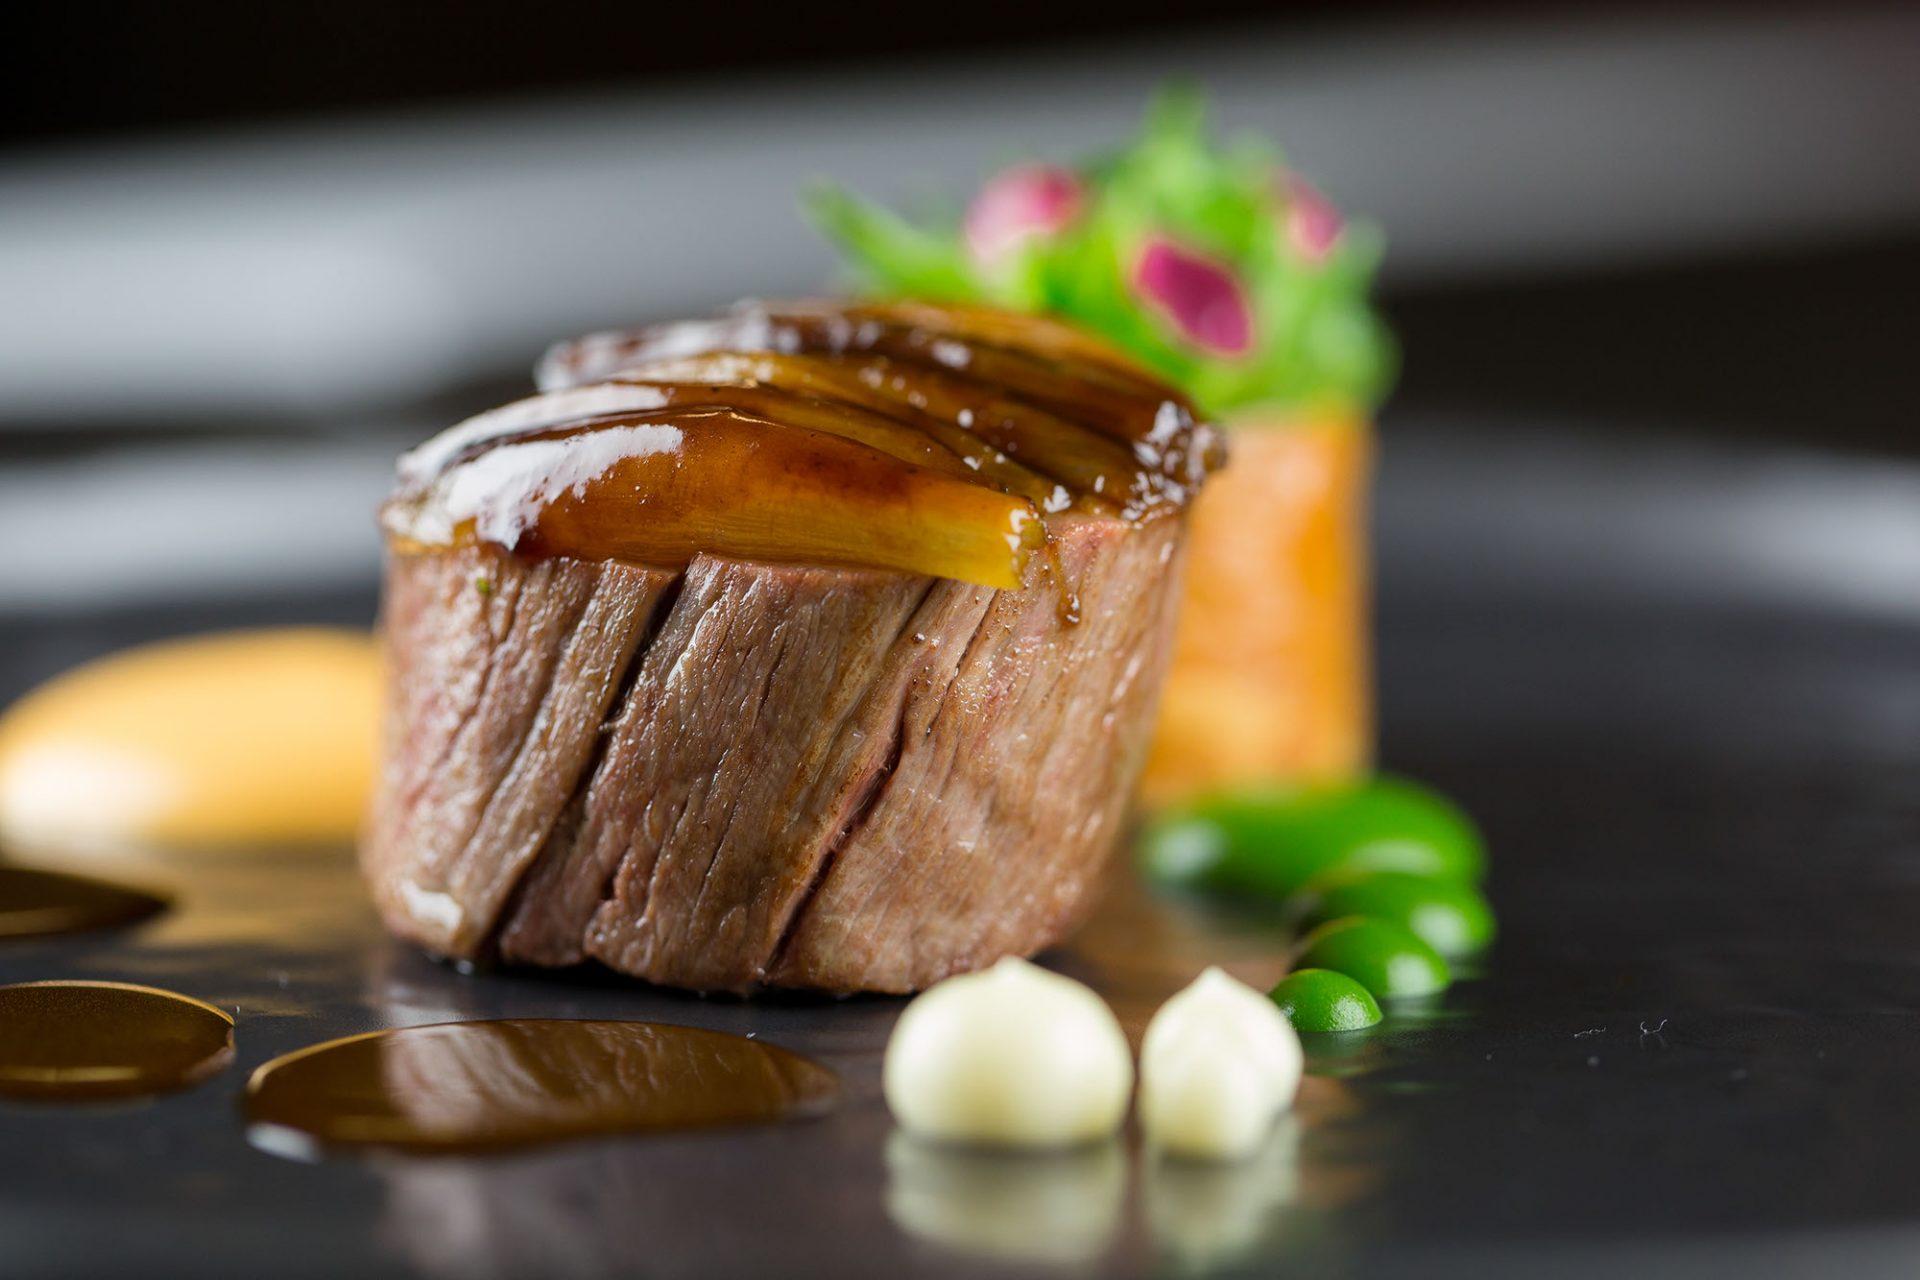 Foodfotografie © Offenblende / Janett JAKA